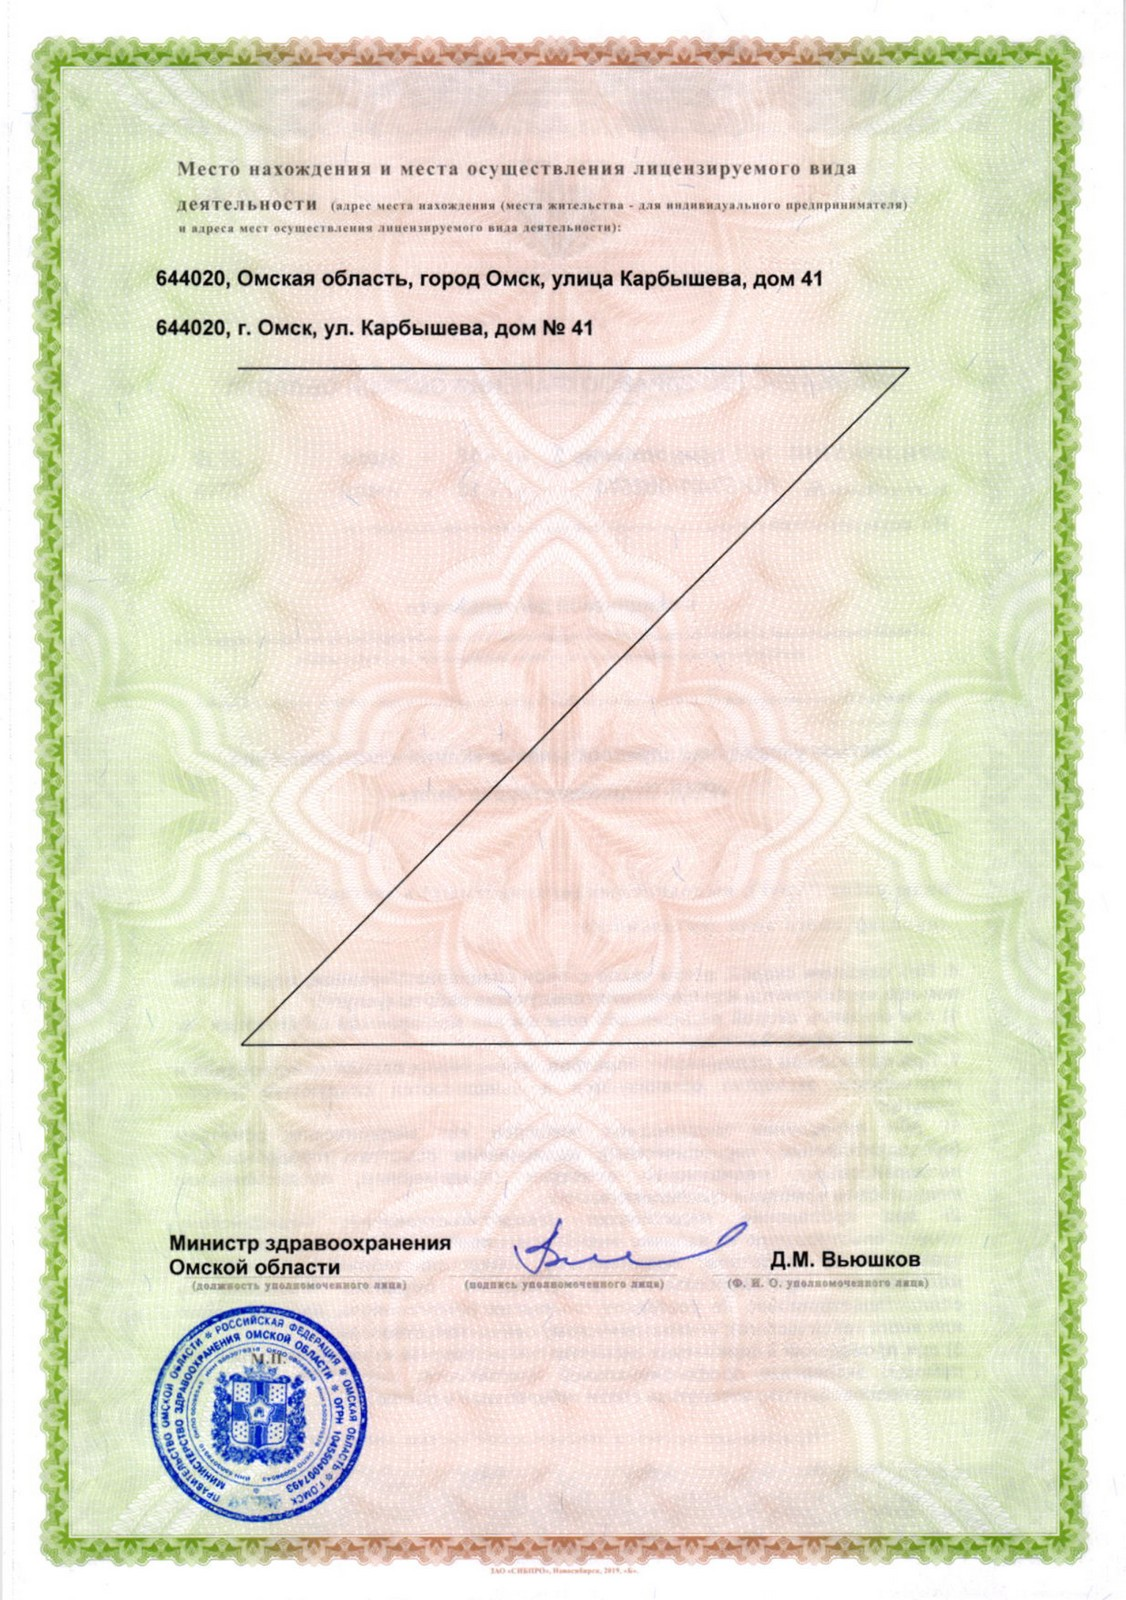 License-2019-07-18_18